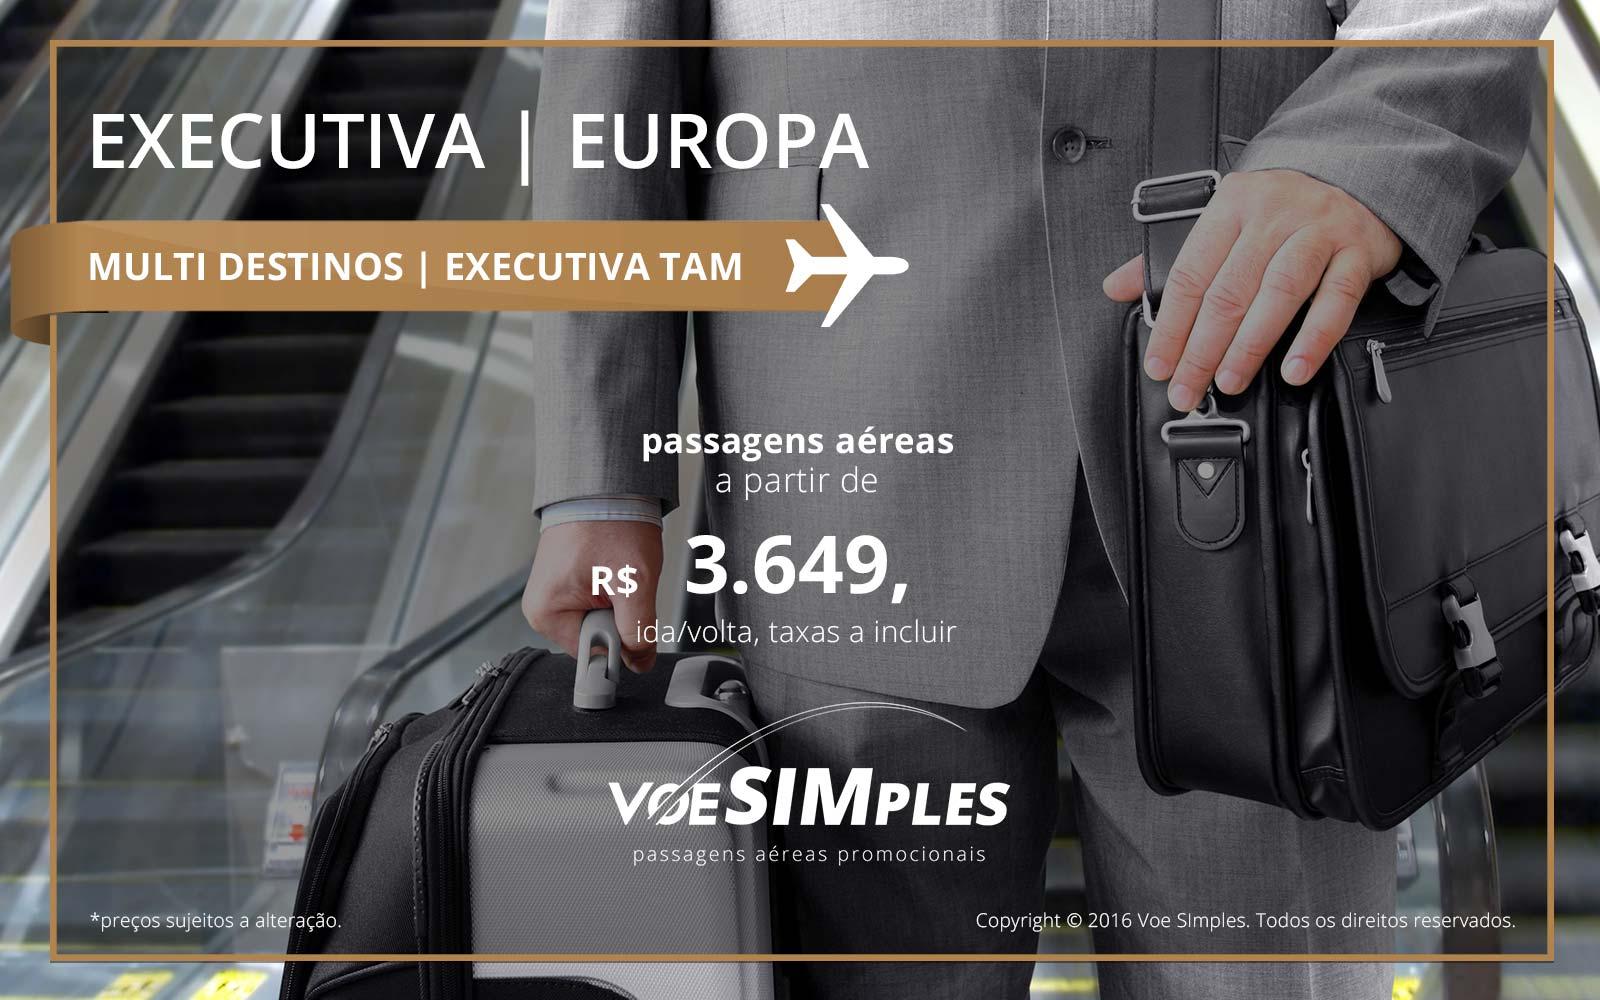 Passagem aérea Classe Executiva TAM para Paris, Madri e Frankfurt